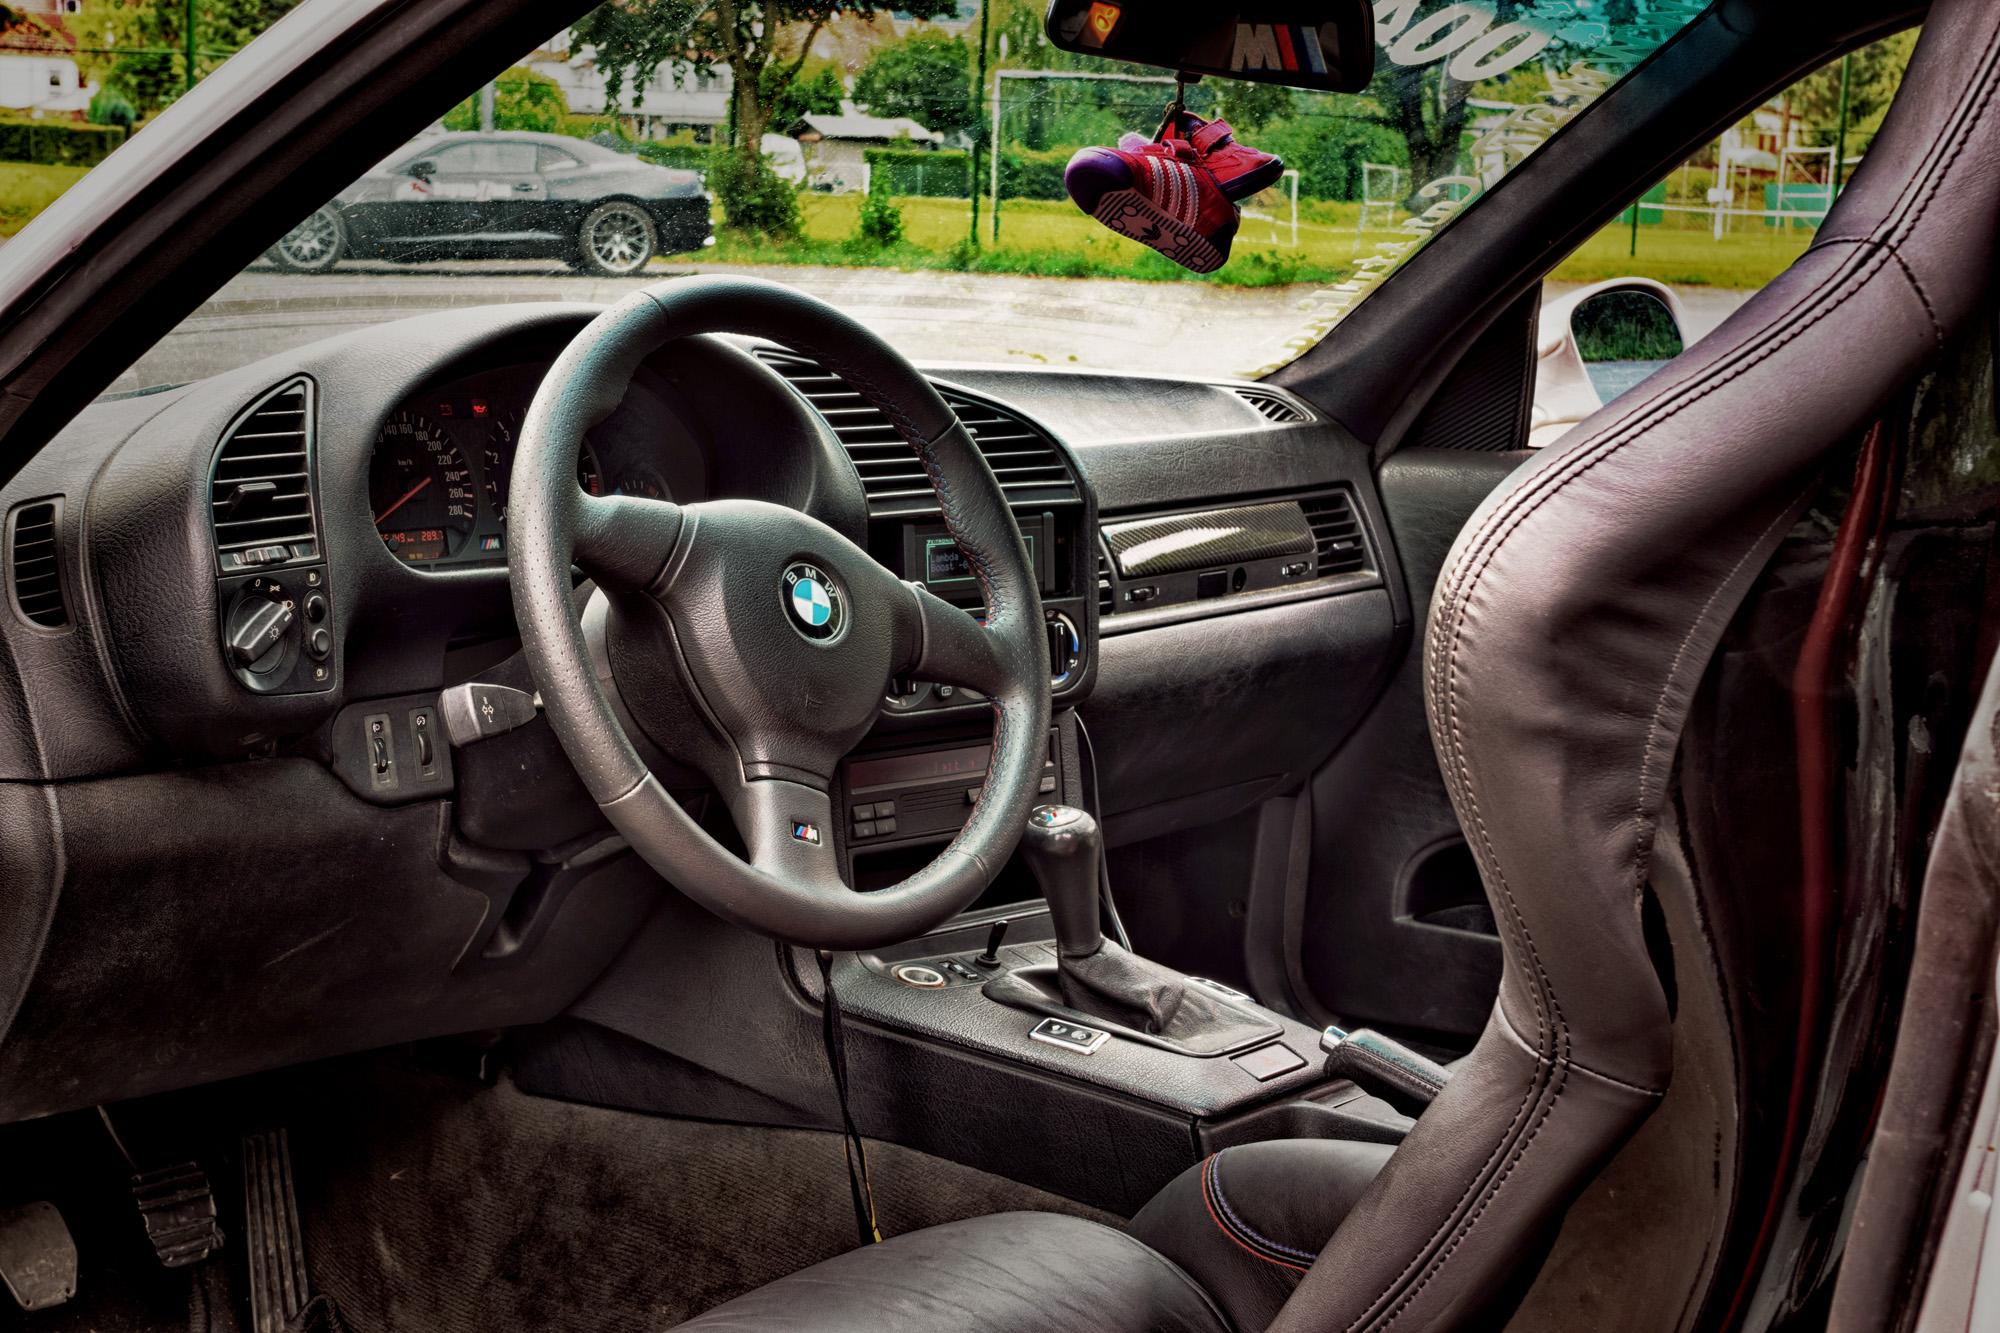 bmw-m3-e36-turbo-tr-carstyling-22